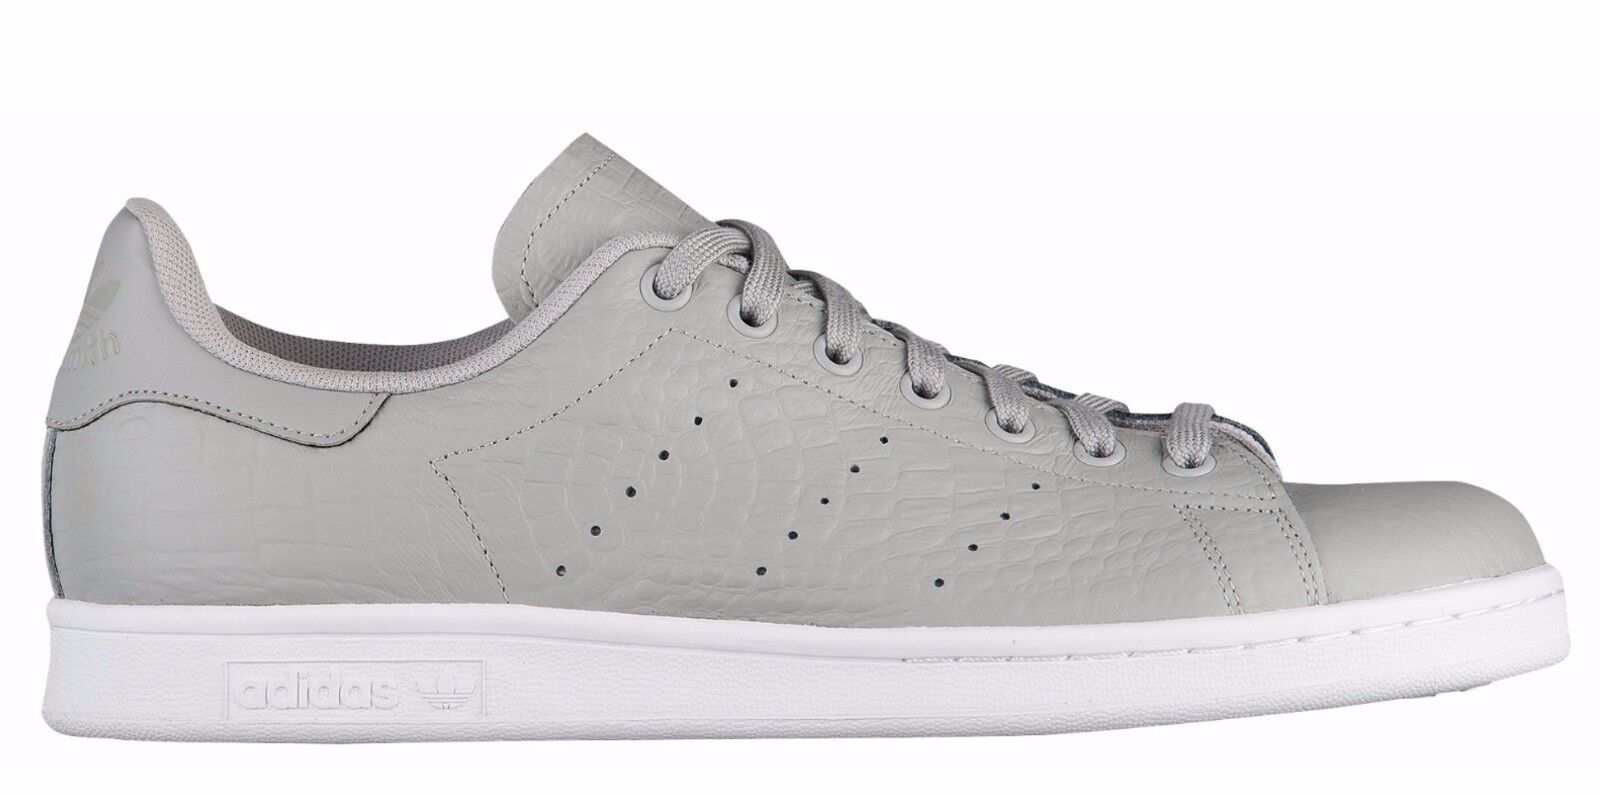 NEW adidas Originals STAN SMITH SNAKESKIN Pattern Gray White AQ2728 c1 rod laver